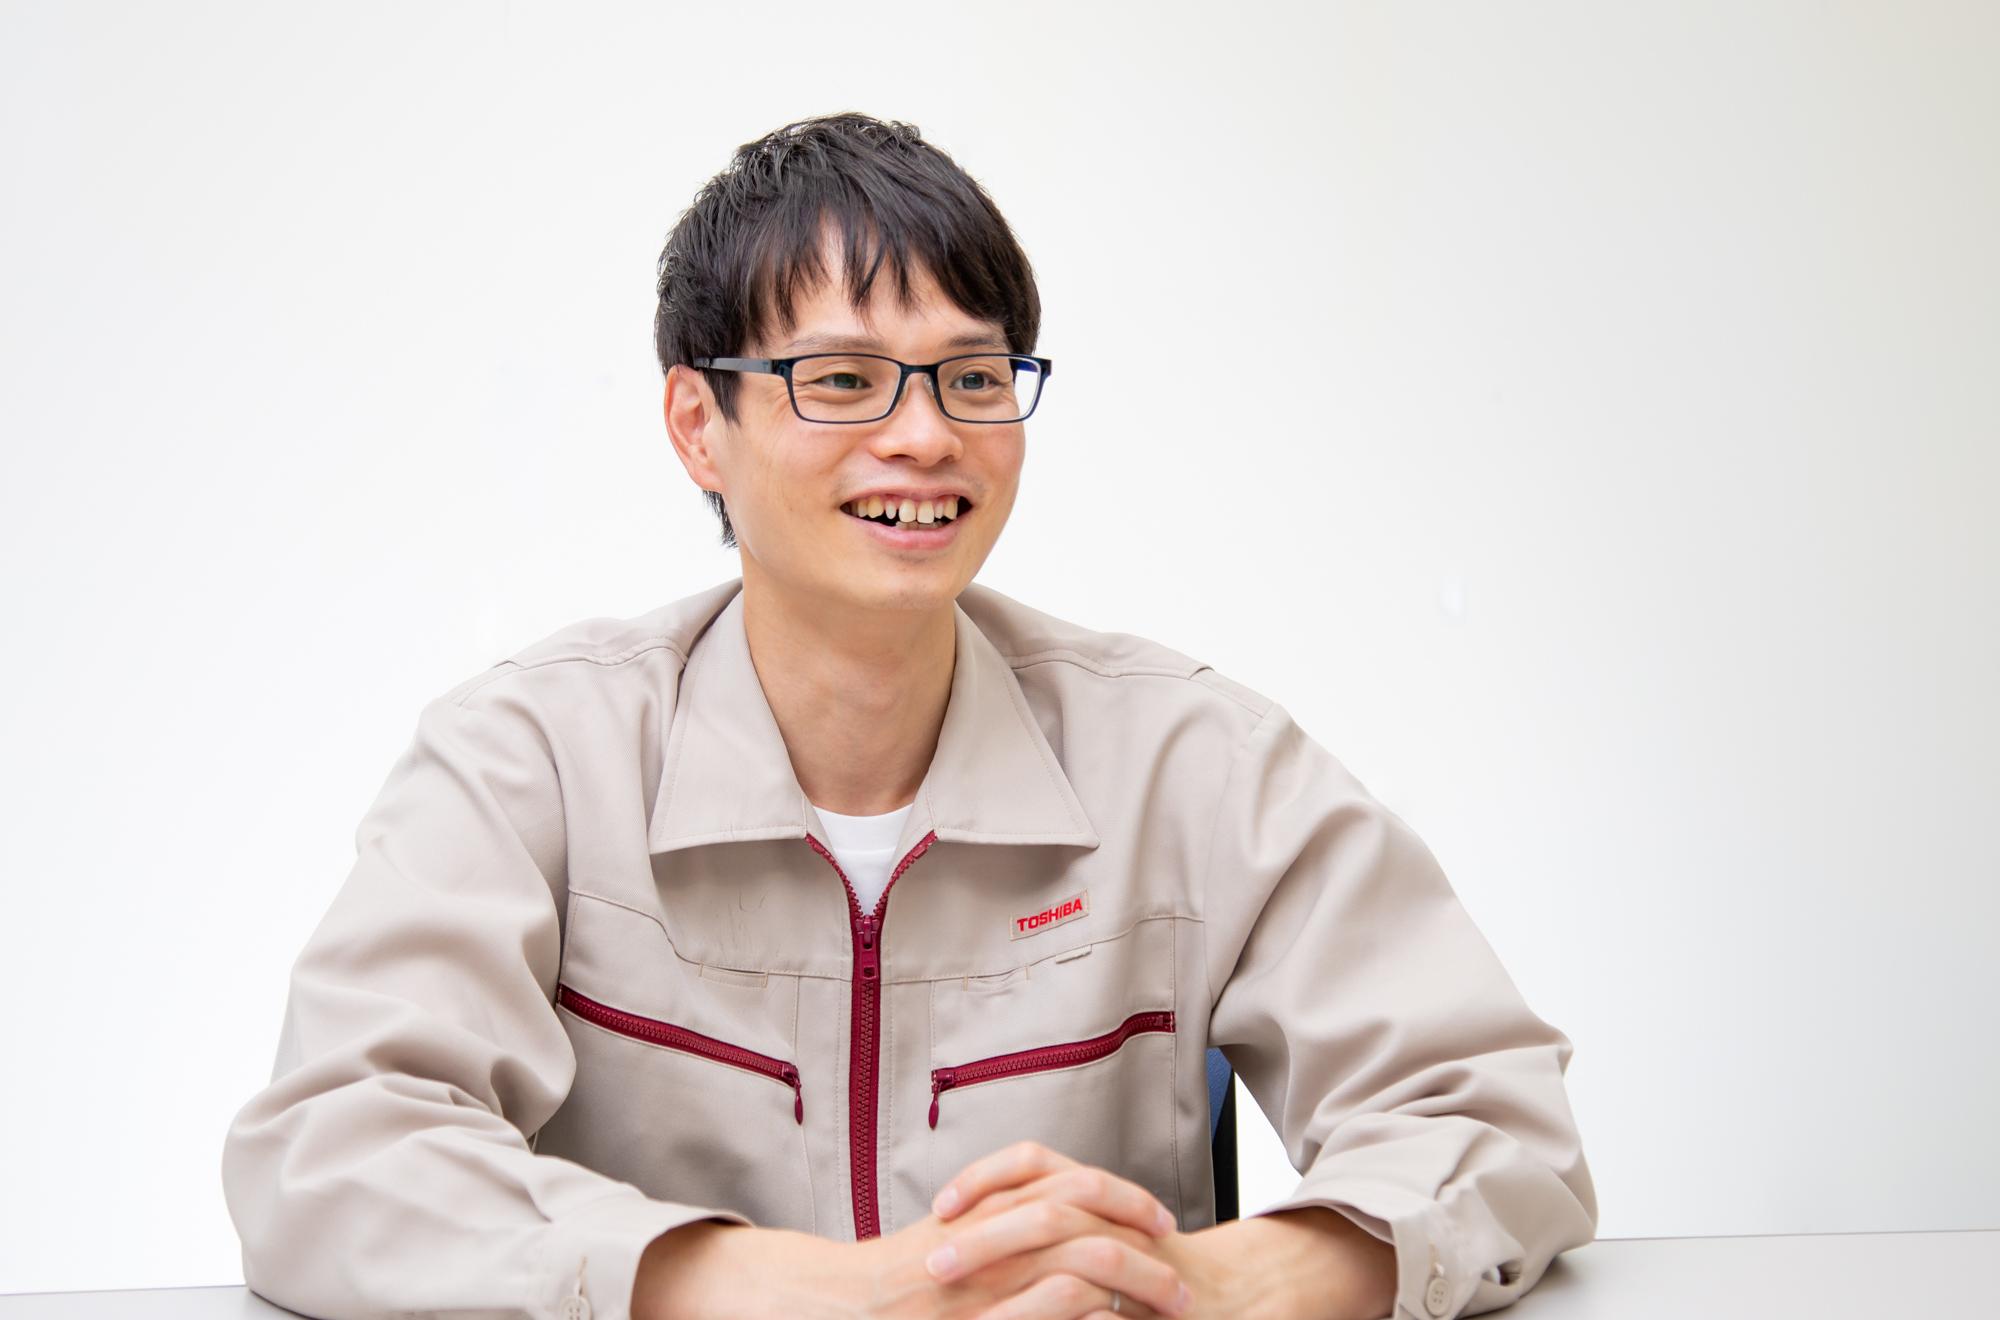 Masahiro Kurosu, Battery System Development Group 1, Battery System Development Department, Battery Division, Toshiba Corporation(1)